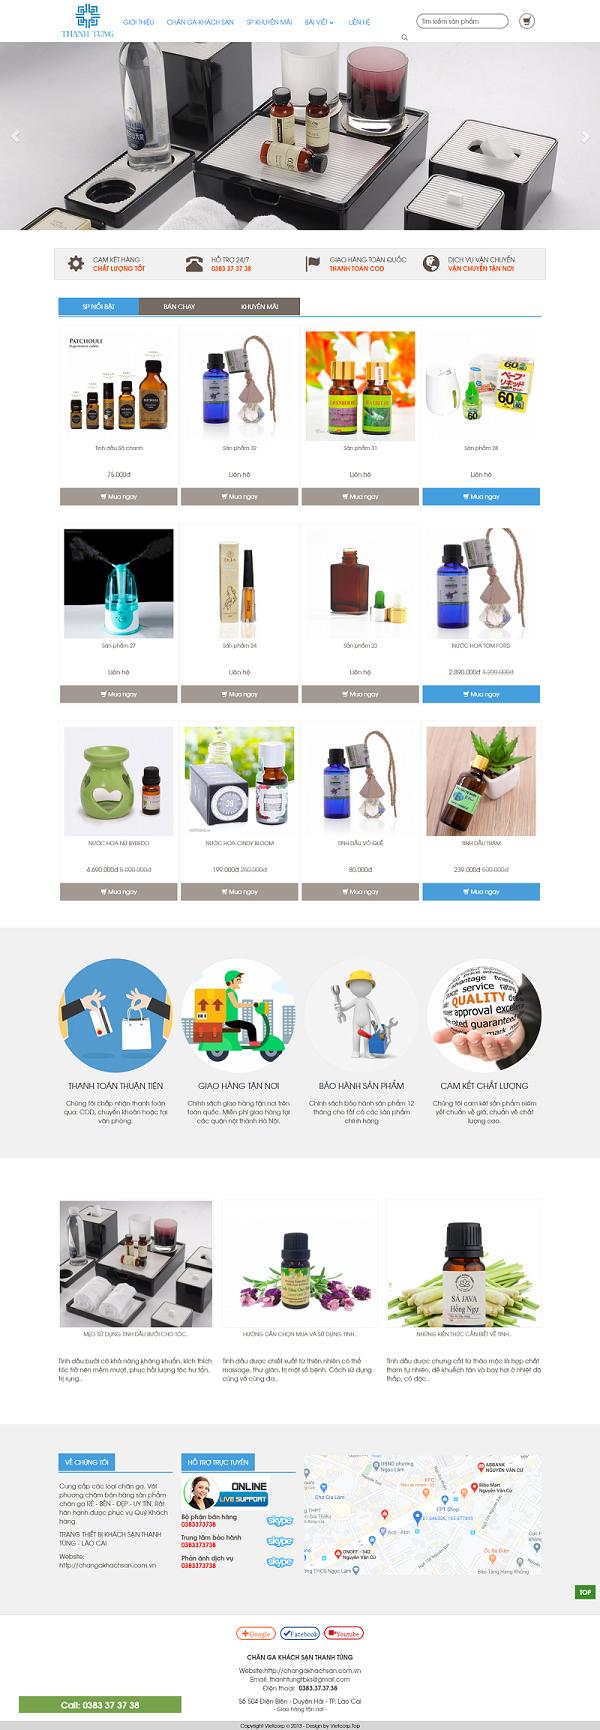 Mẫu Website Bán Chăn Ga Khách Sạn